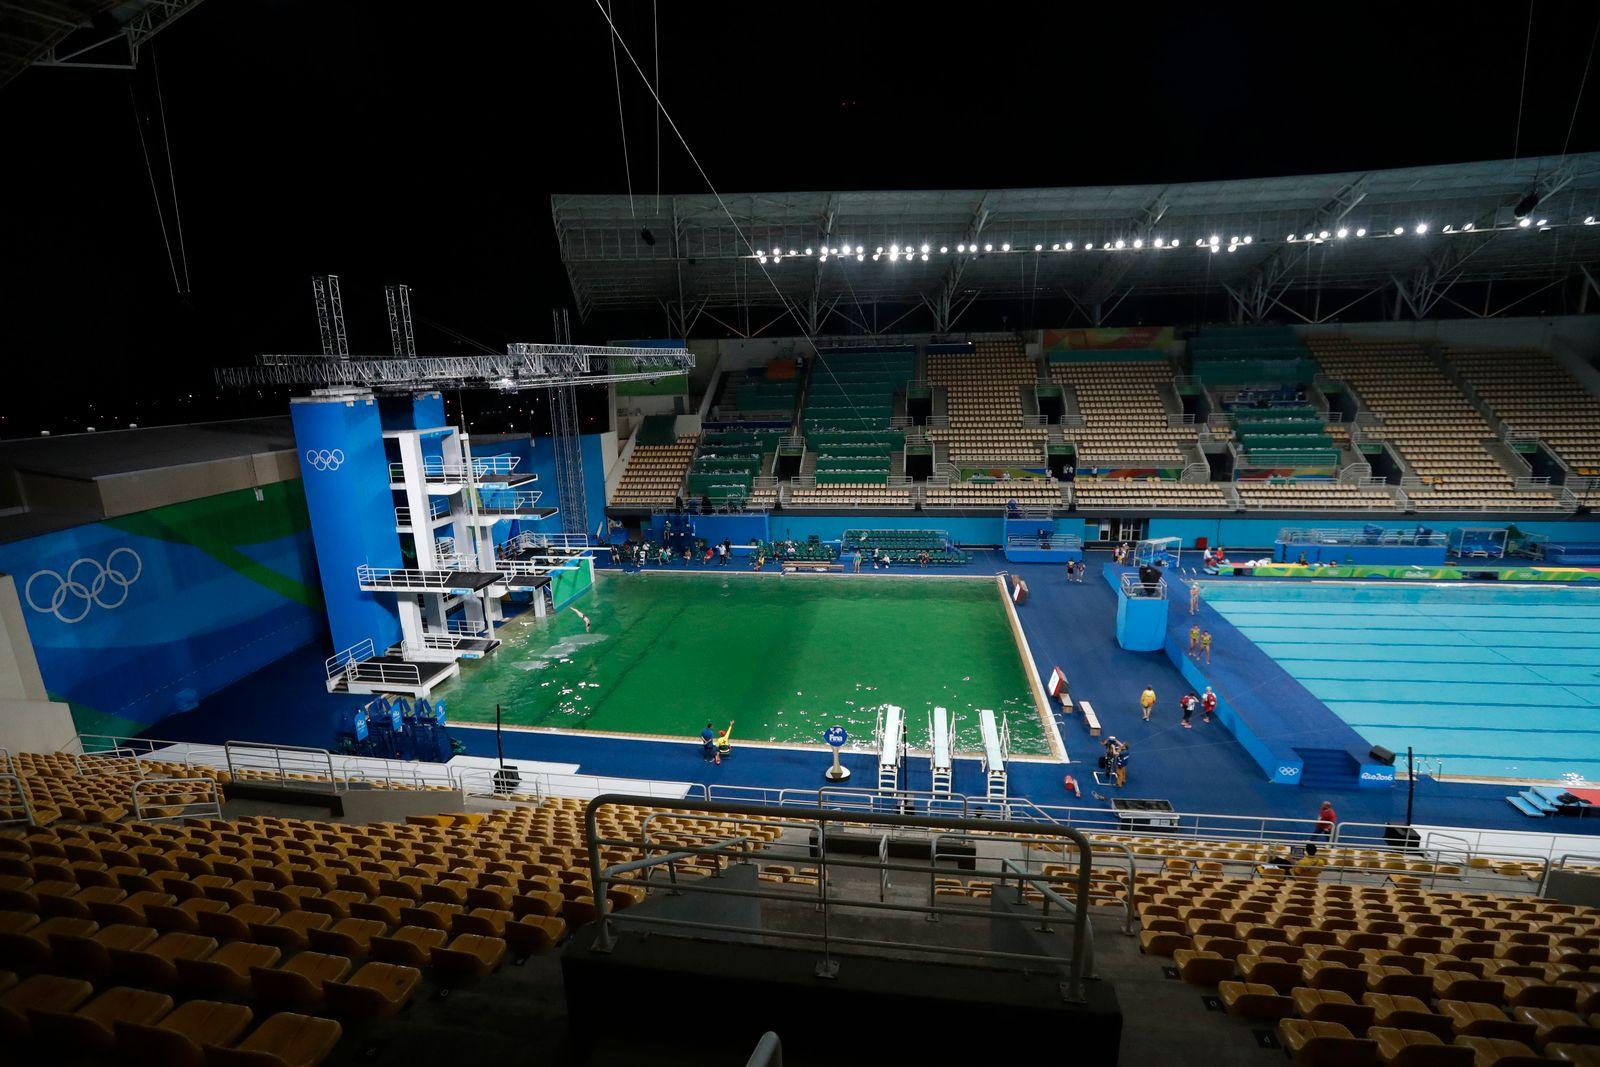 Rio / Olympia / Grünes Wasser